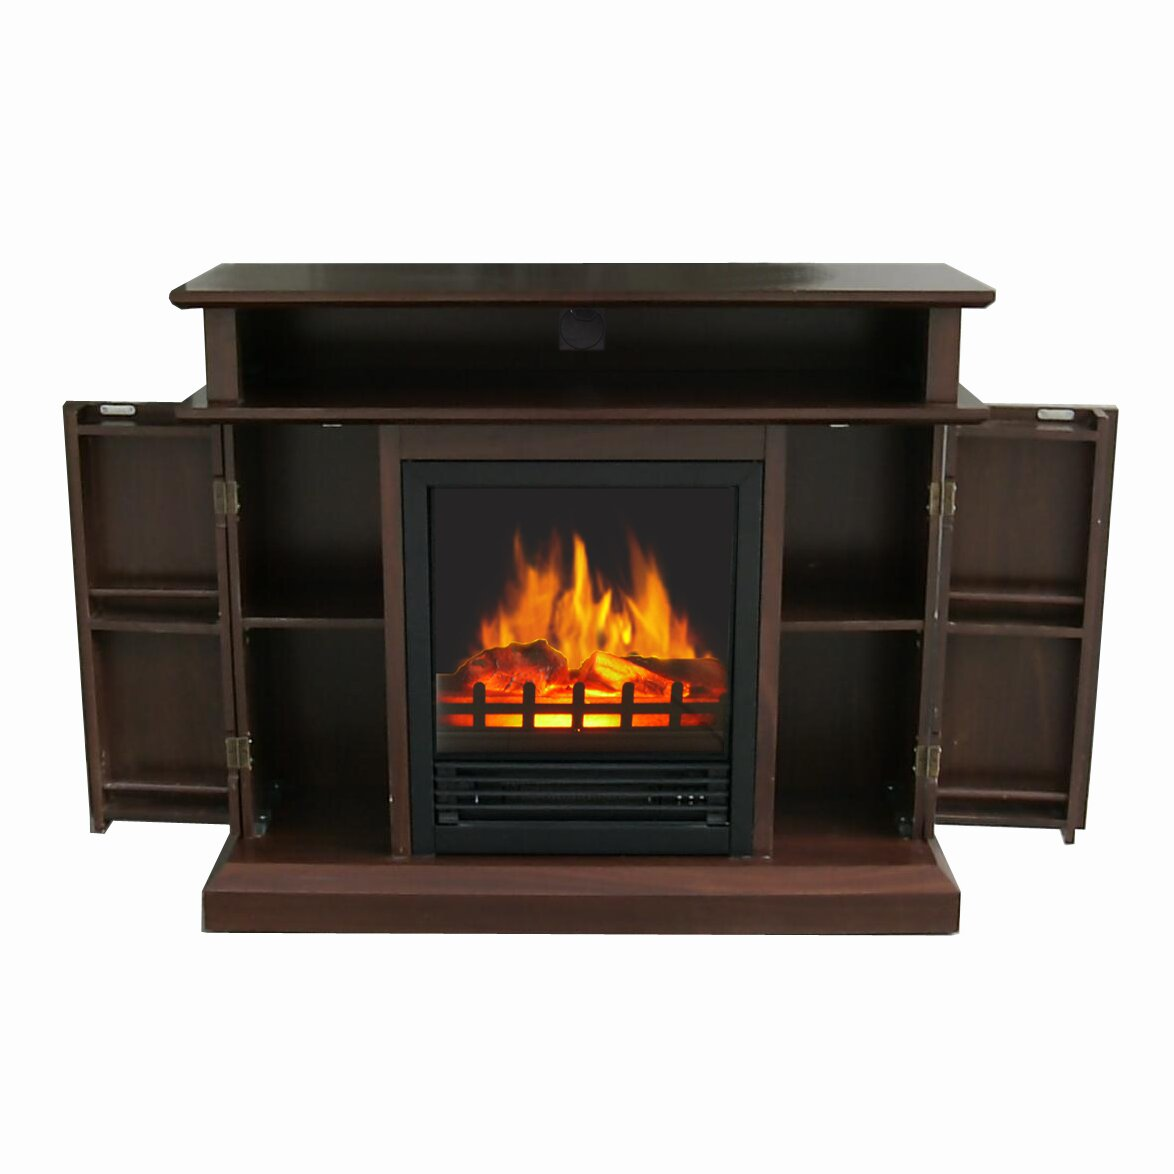 stonegate melrose multi media electric fireplace